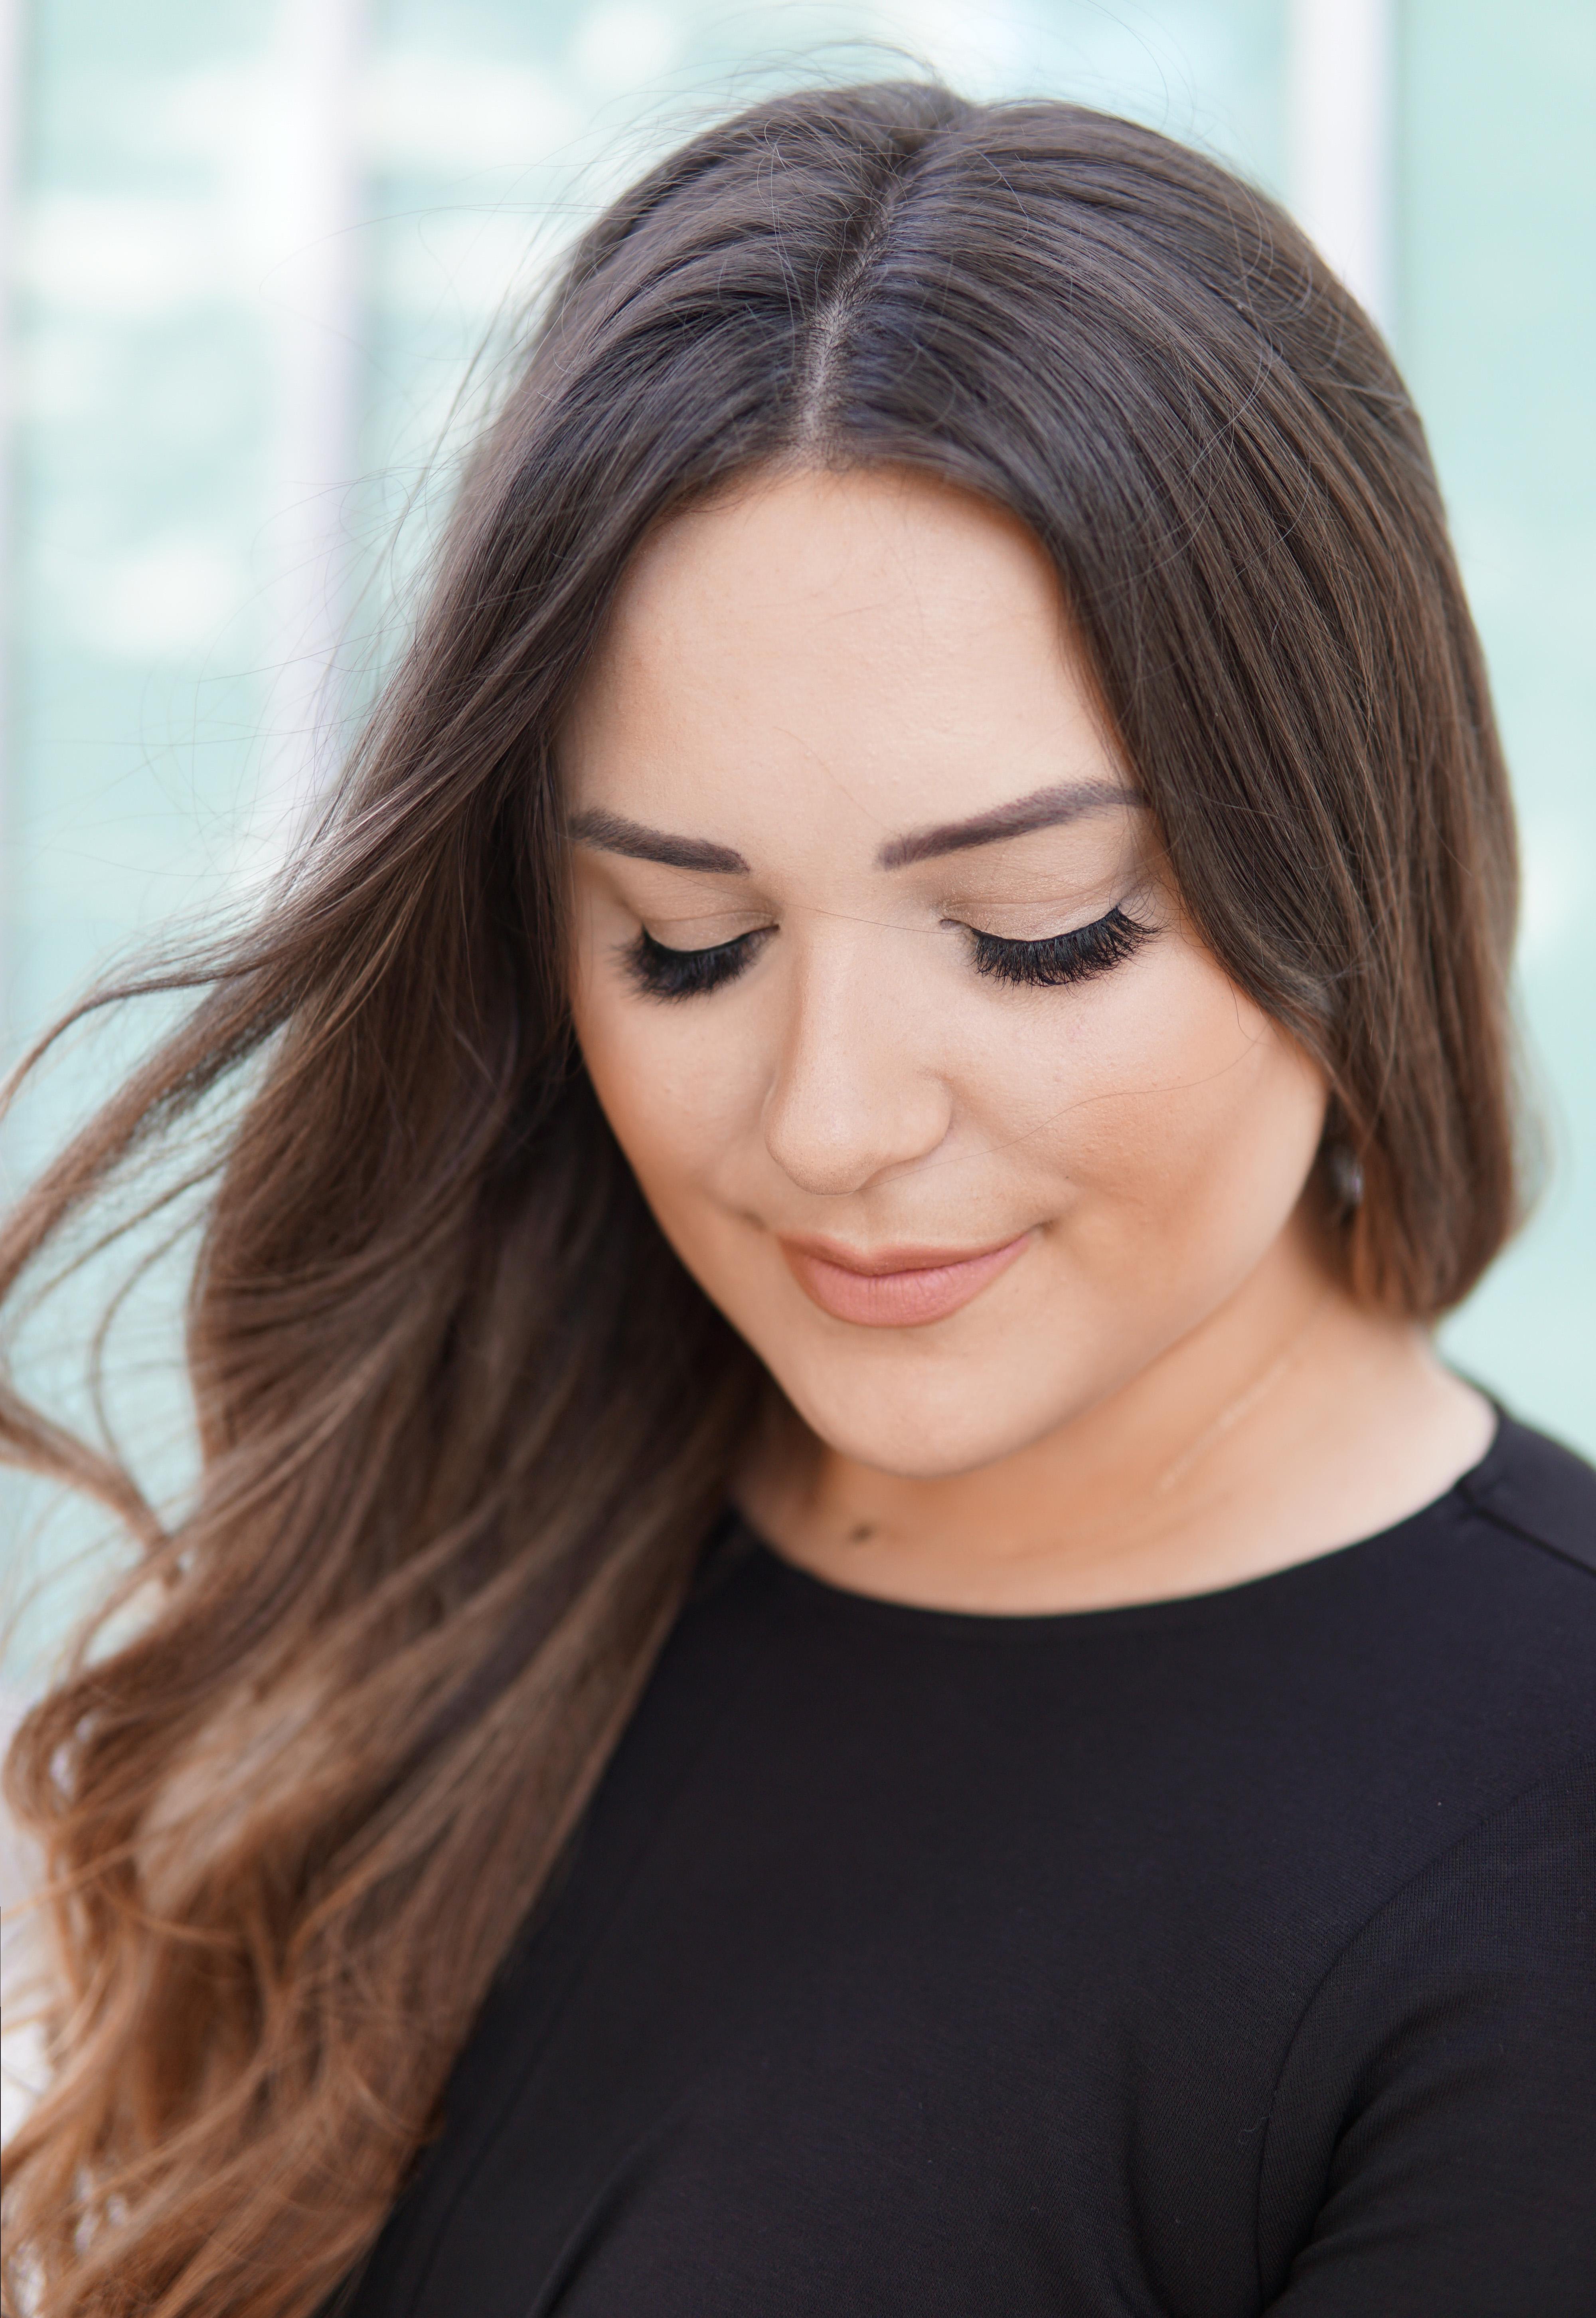 choose false lashes | beauty blogger mash elle | lash tutorial | false lashes